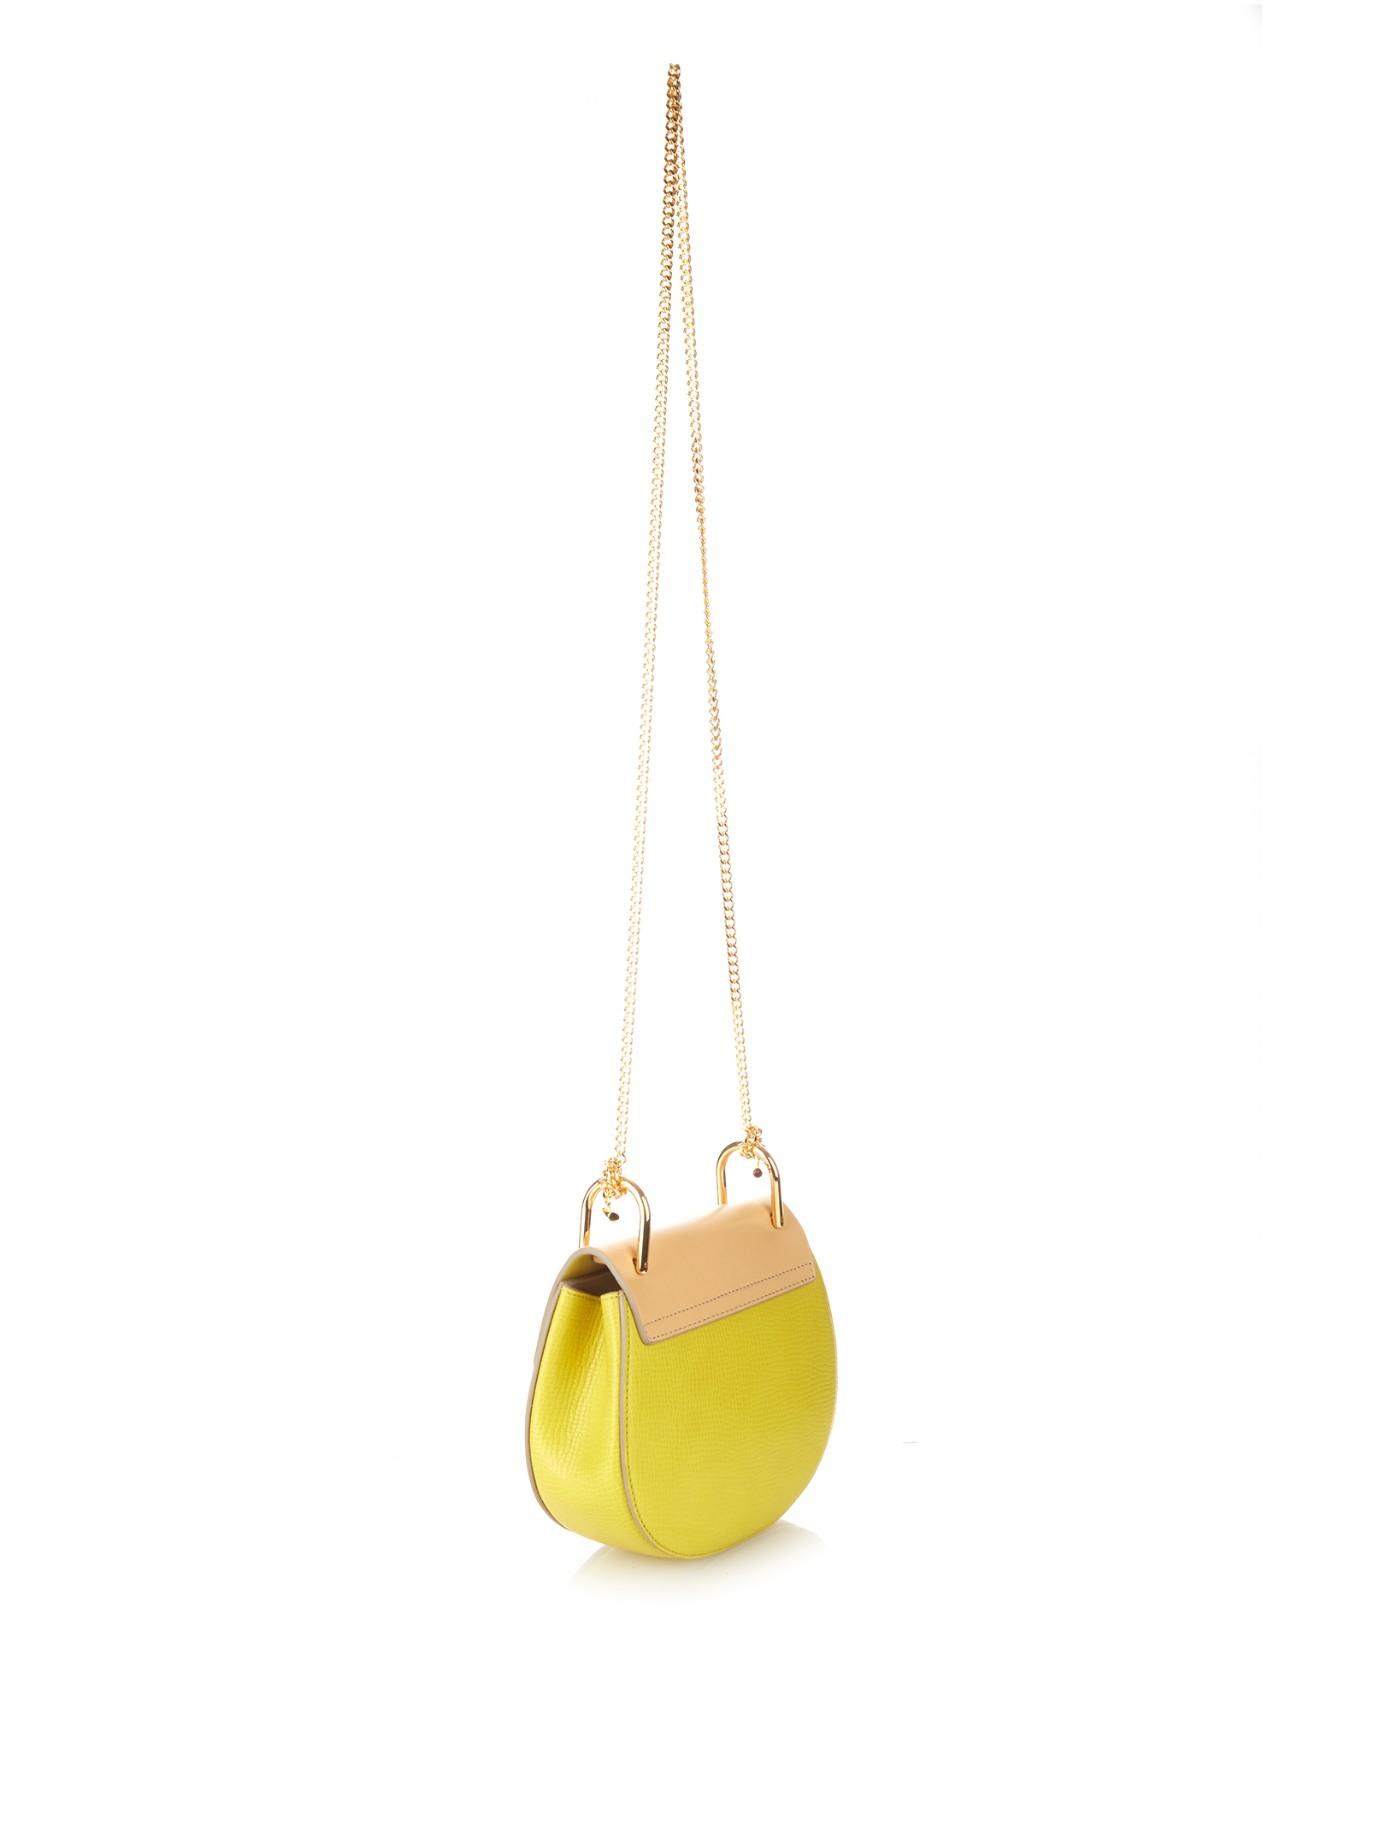 fake chloe handbags - Chlo�� Drew Mini Leather Cross-Body Bag in Yellow | Lyst